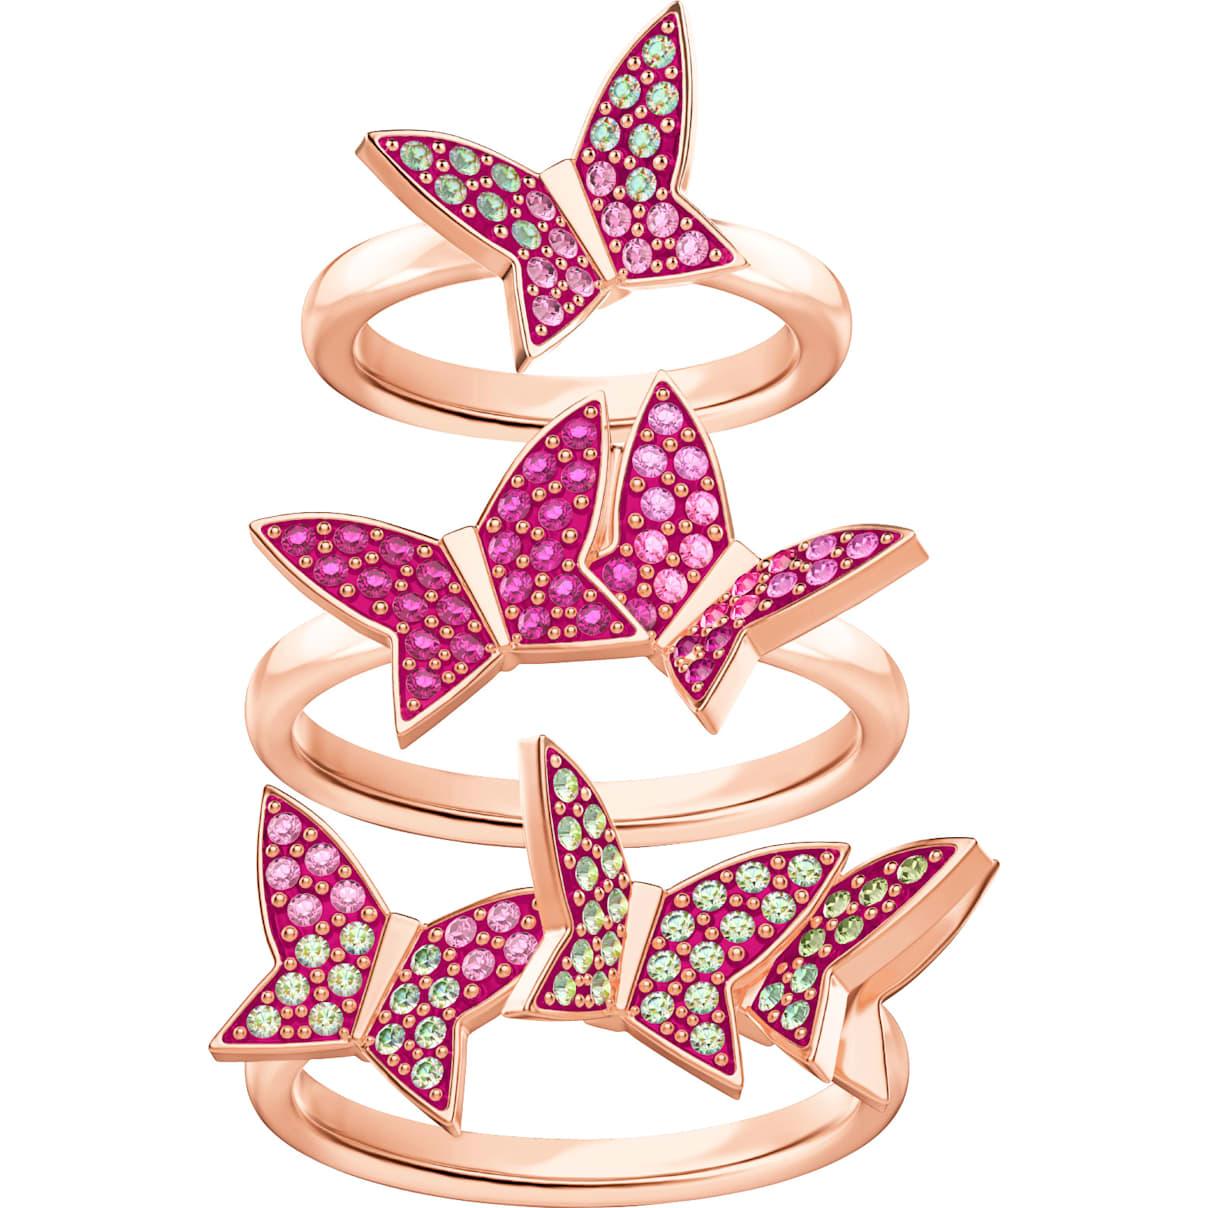 Swarovski Lilia Ring Set, Multi-colored, Rose-gold tone plated